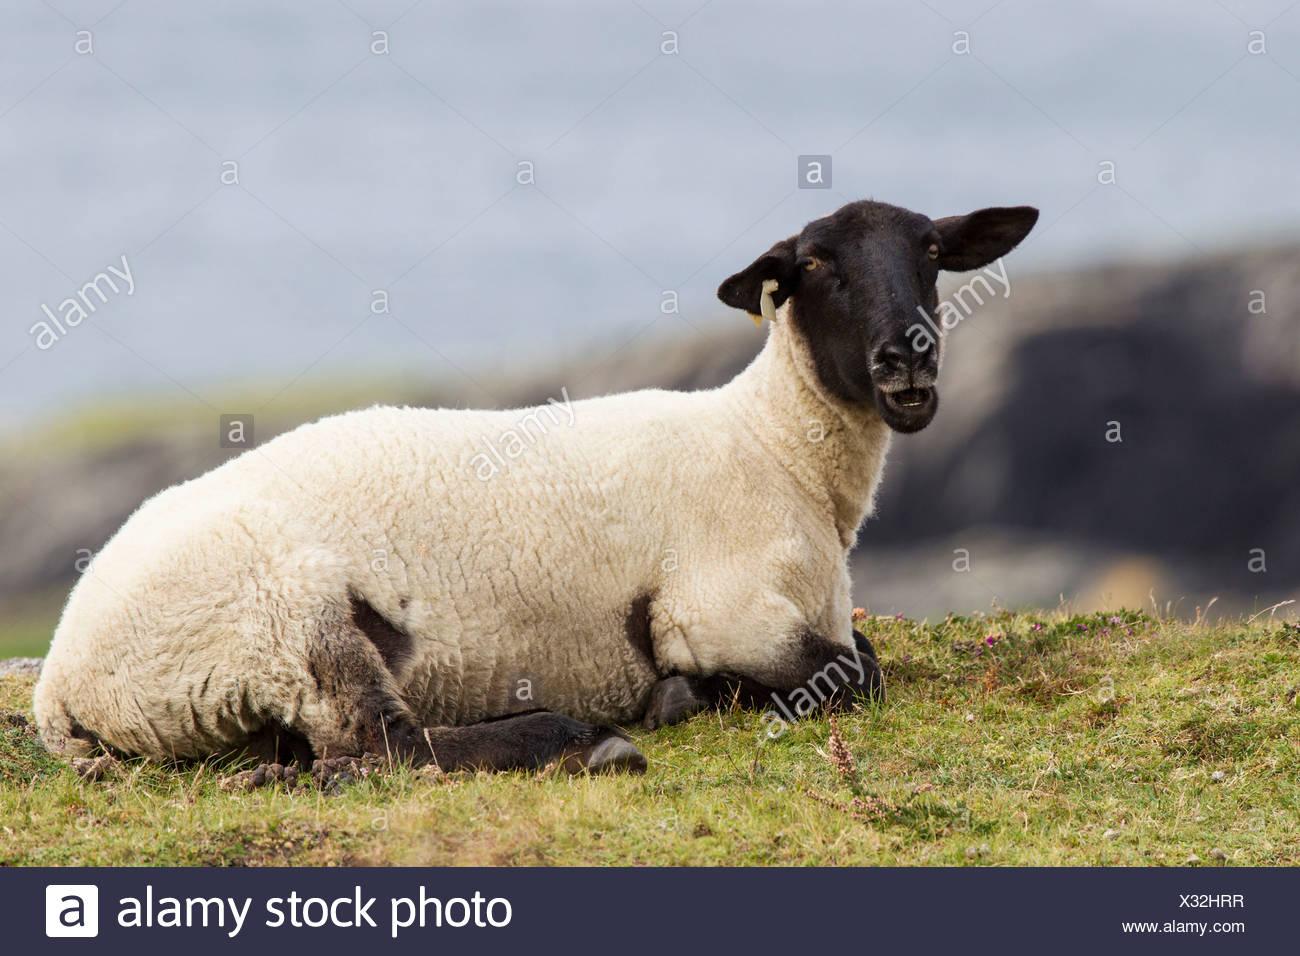 Sheep, Beara Peninsula, Cork, Ireland, Europe - Stock Image